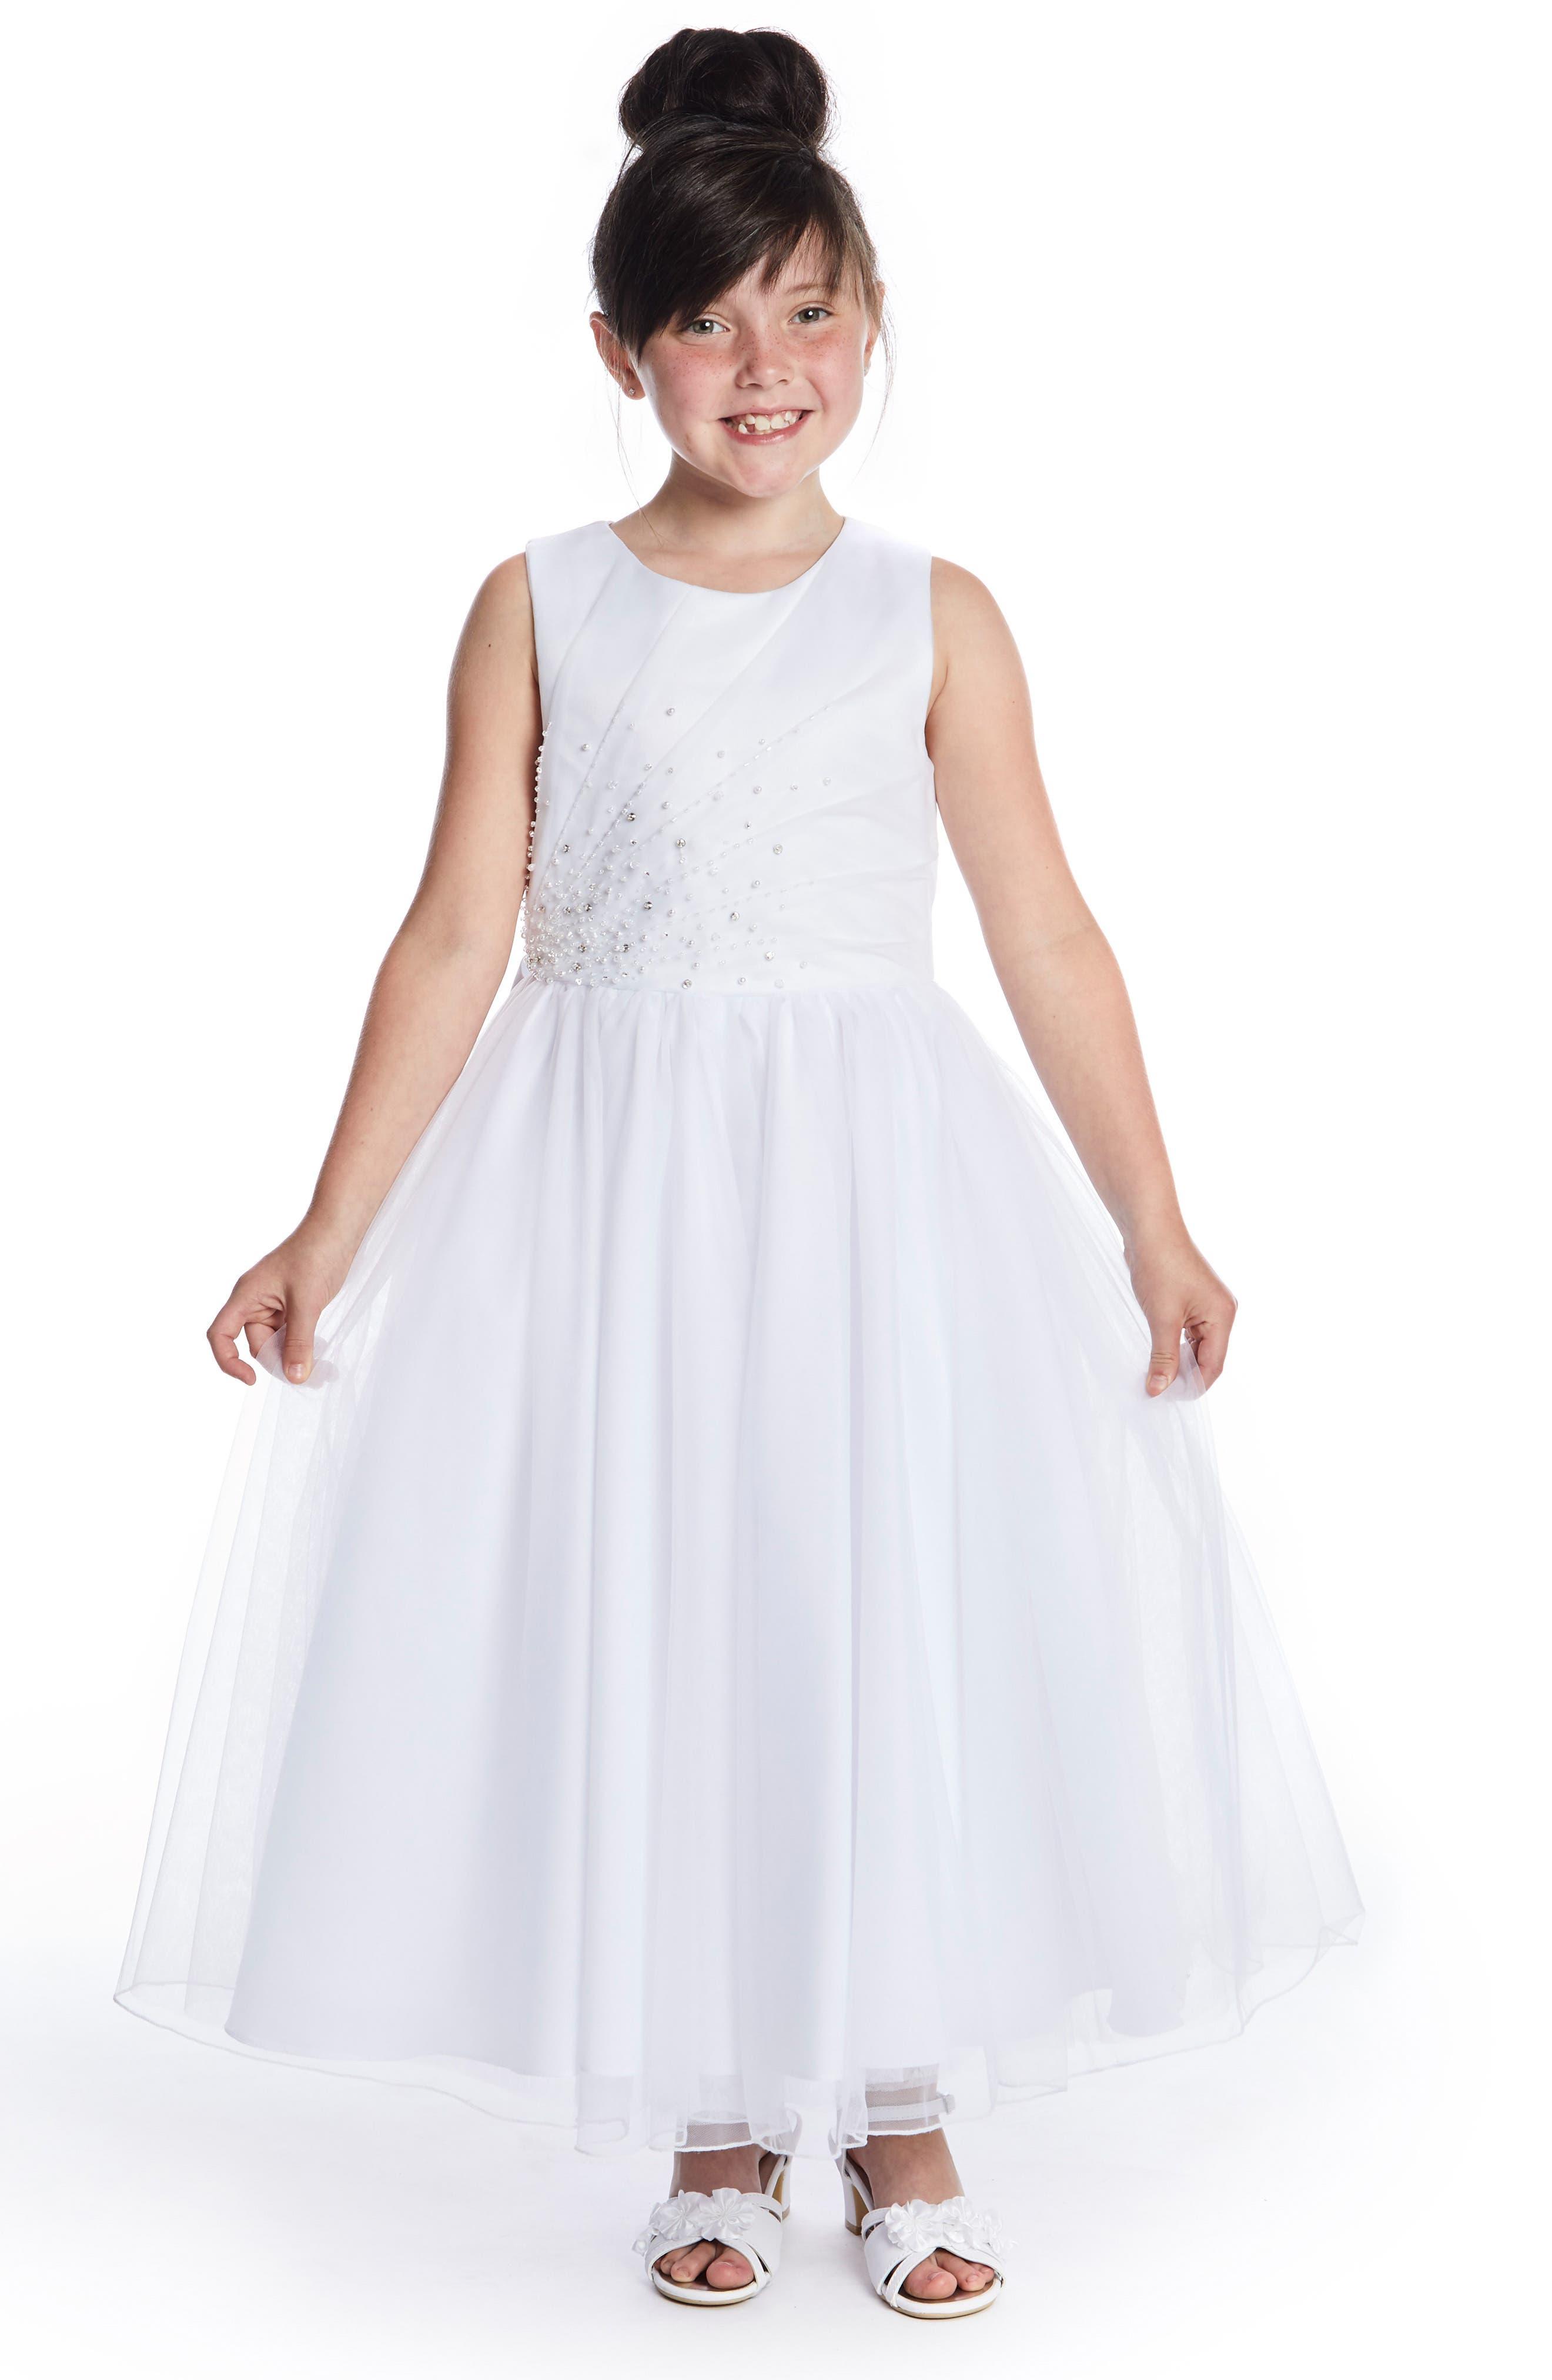 LAUREN MARIE, Beaded First Communion Dress, Main thumbnail 1, color, WHITE